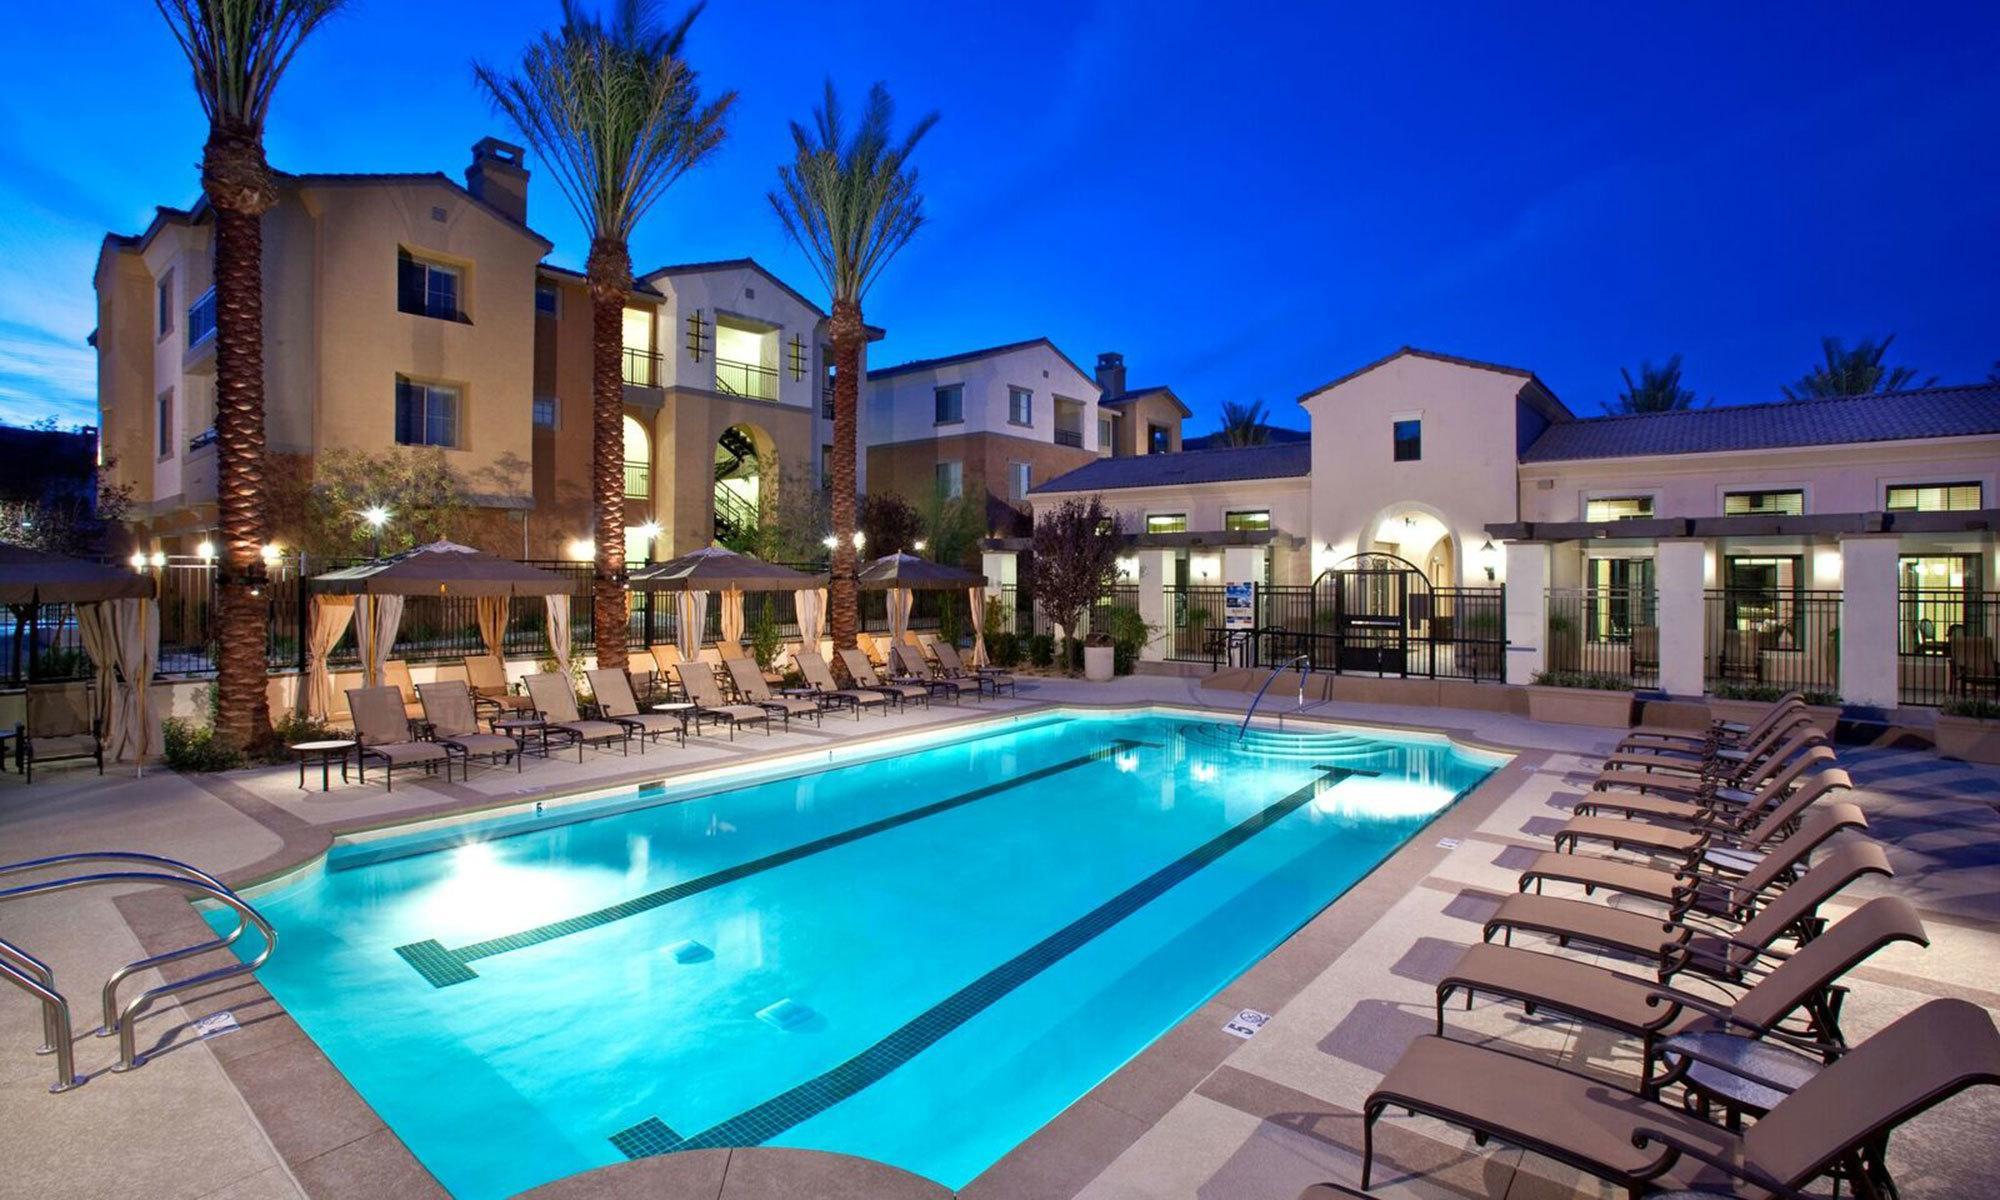 centennial hills las vegas nv apartments for rent